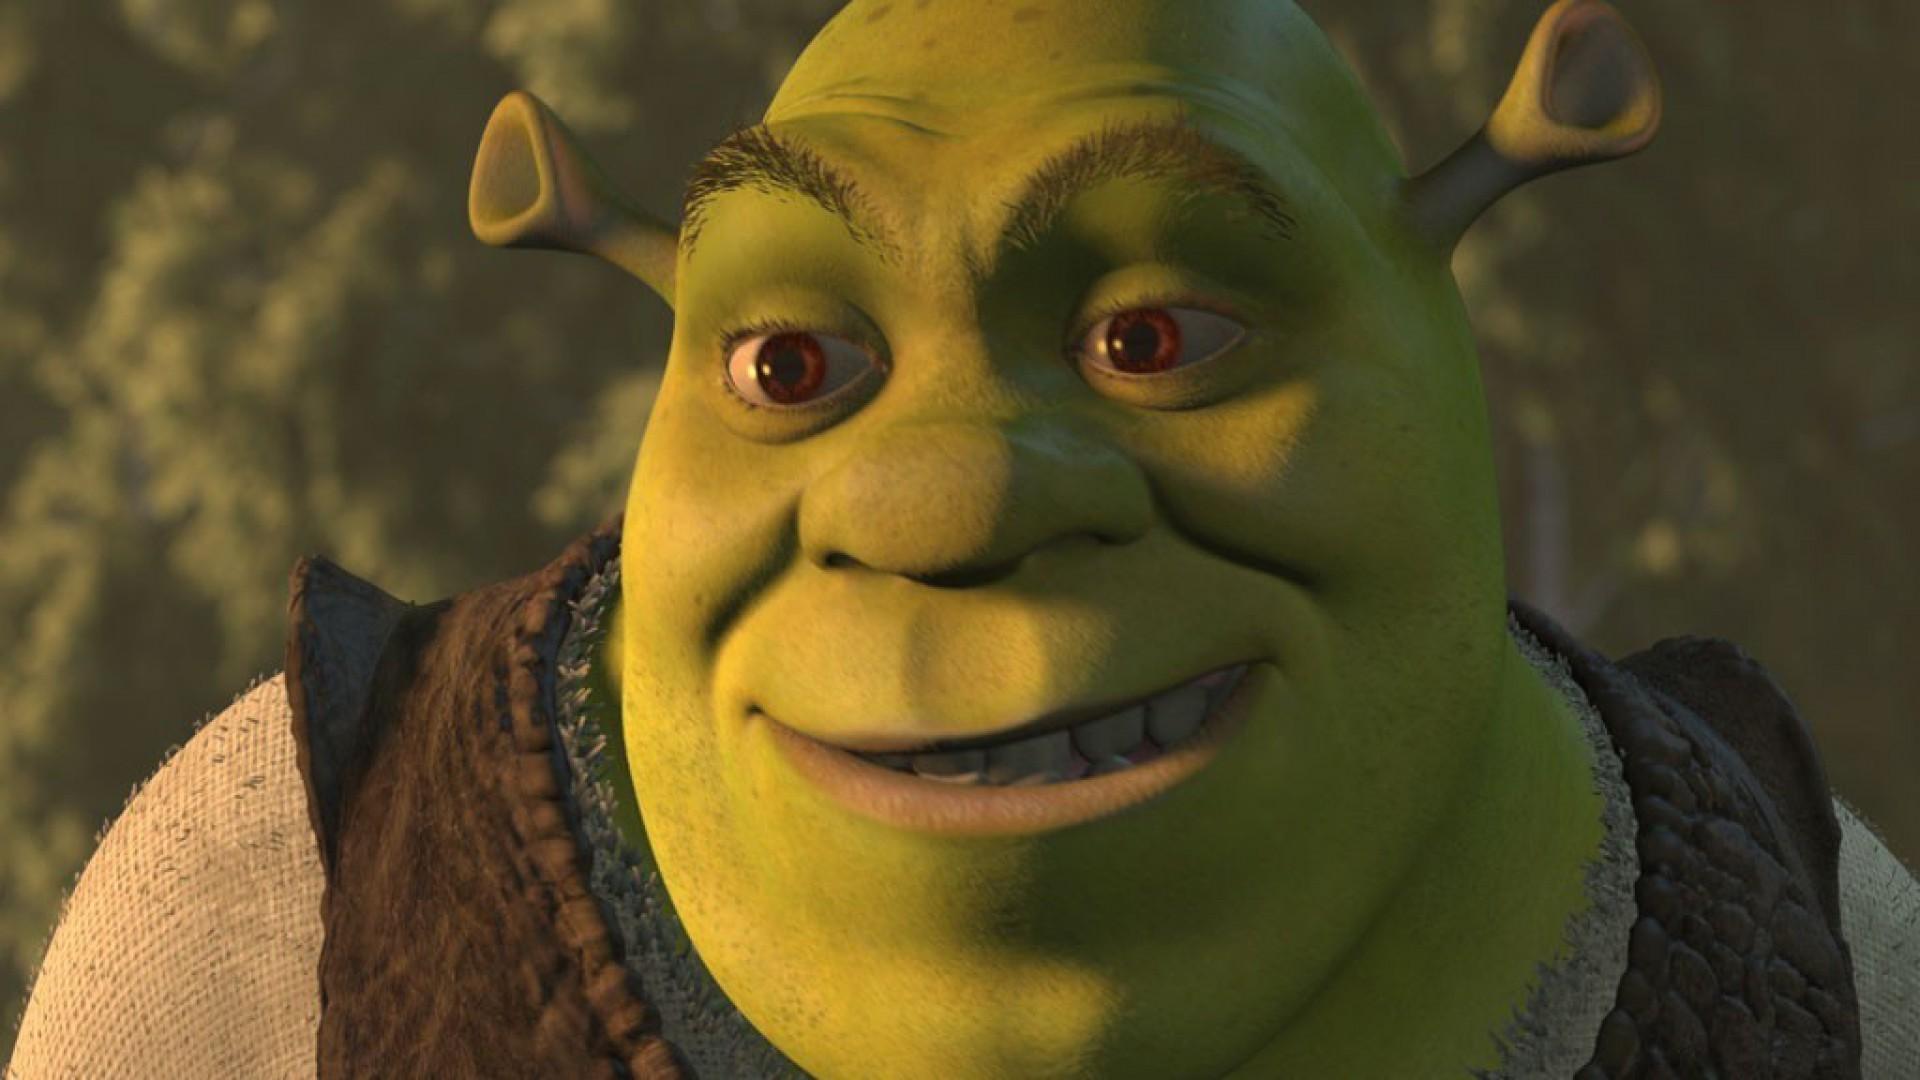 Shrek is definitly not drek